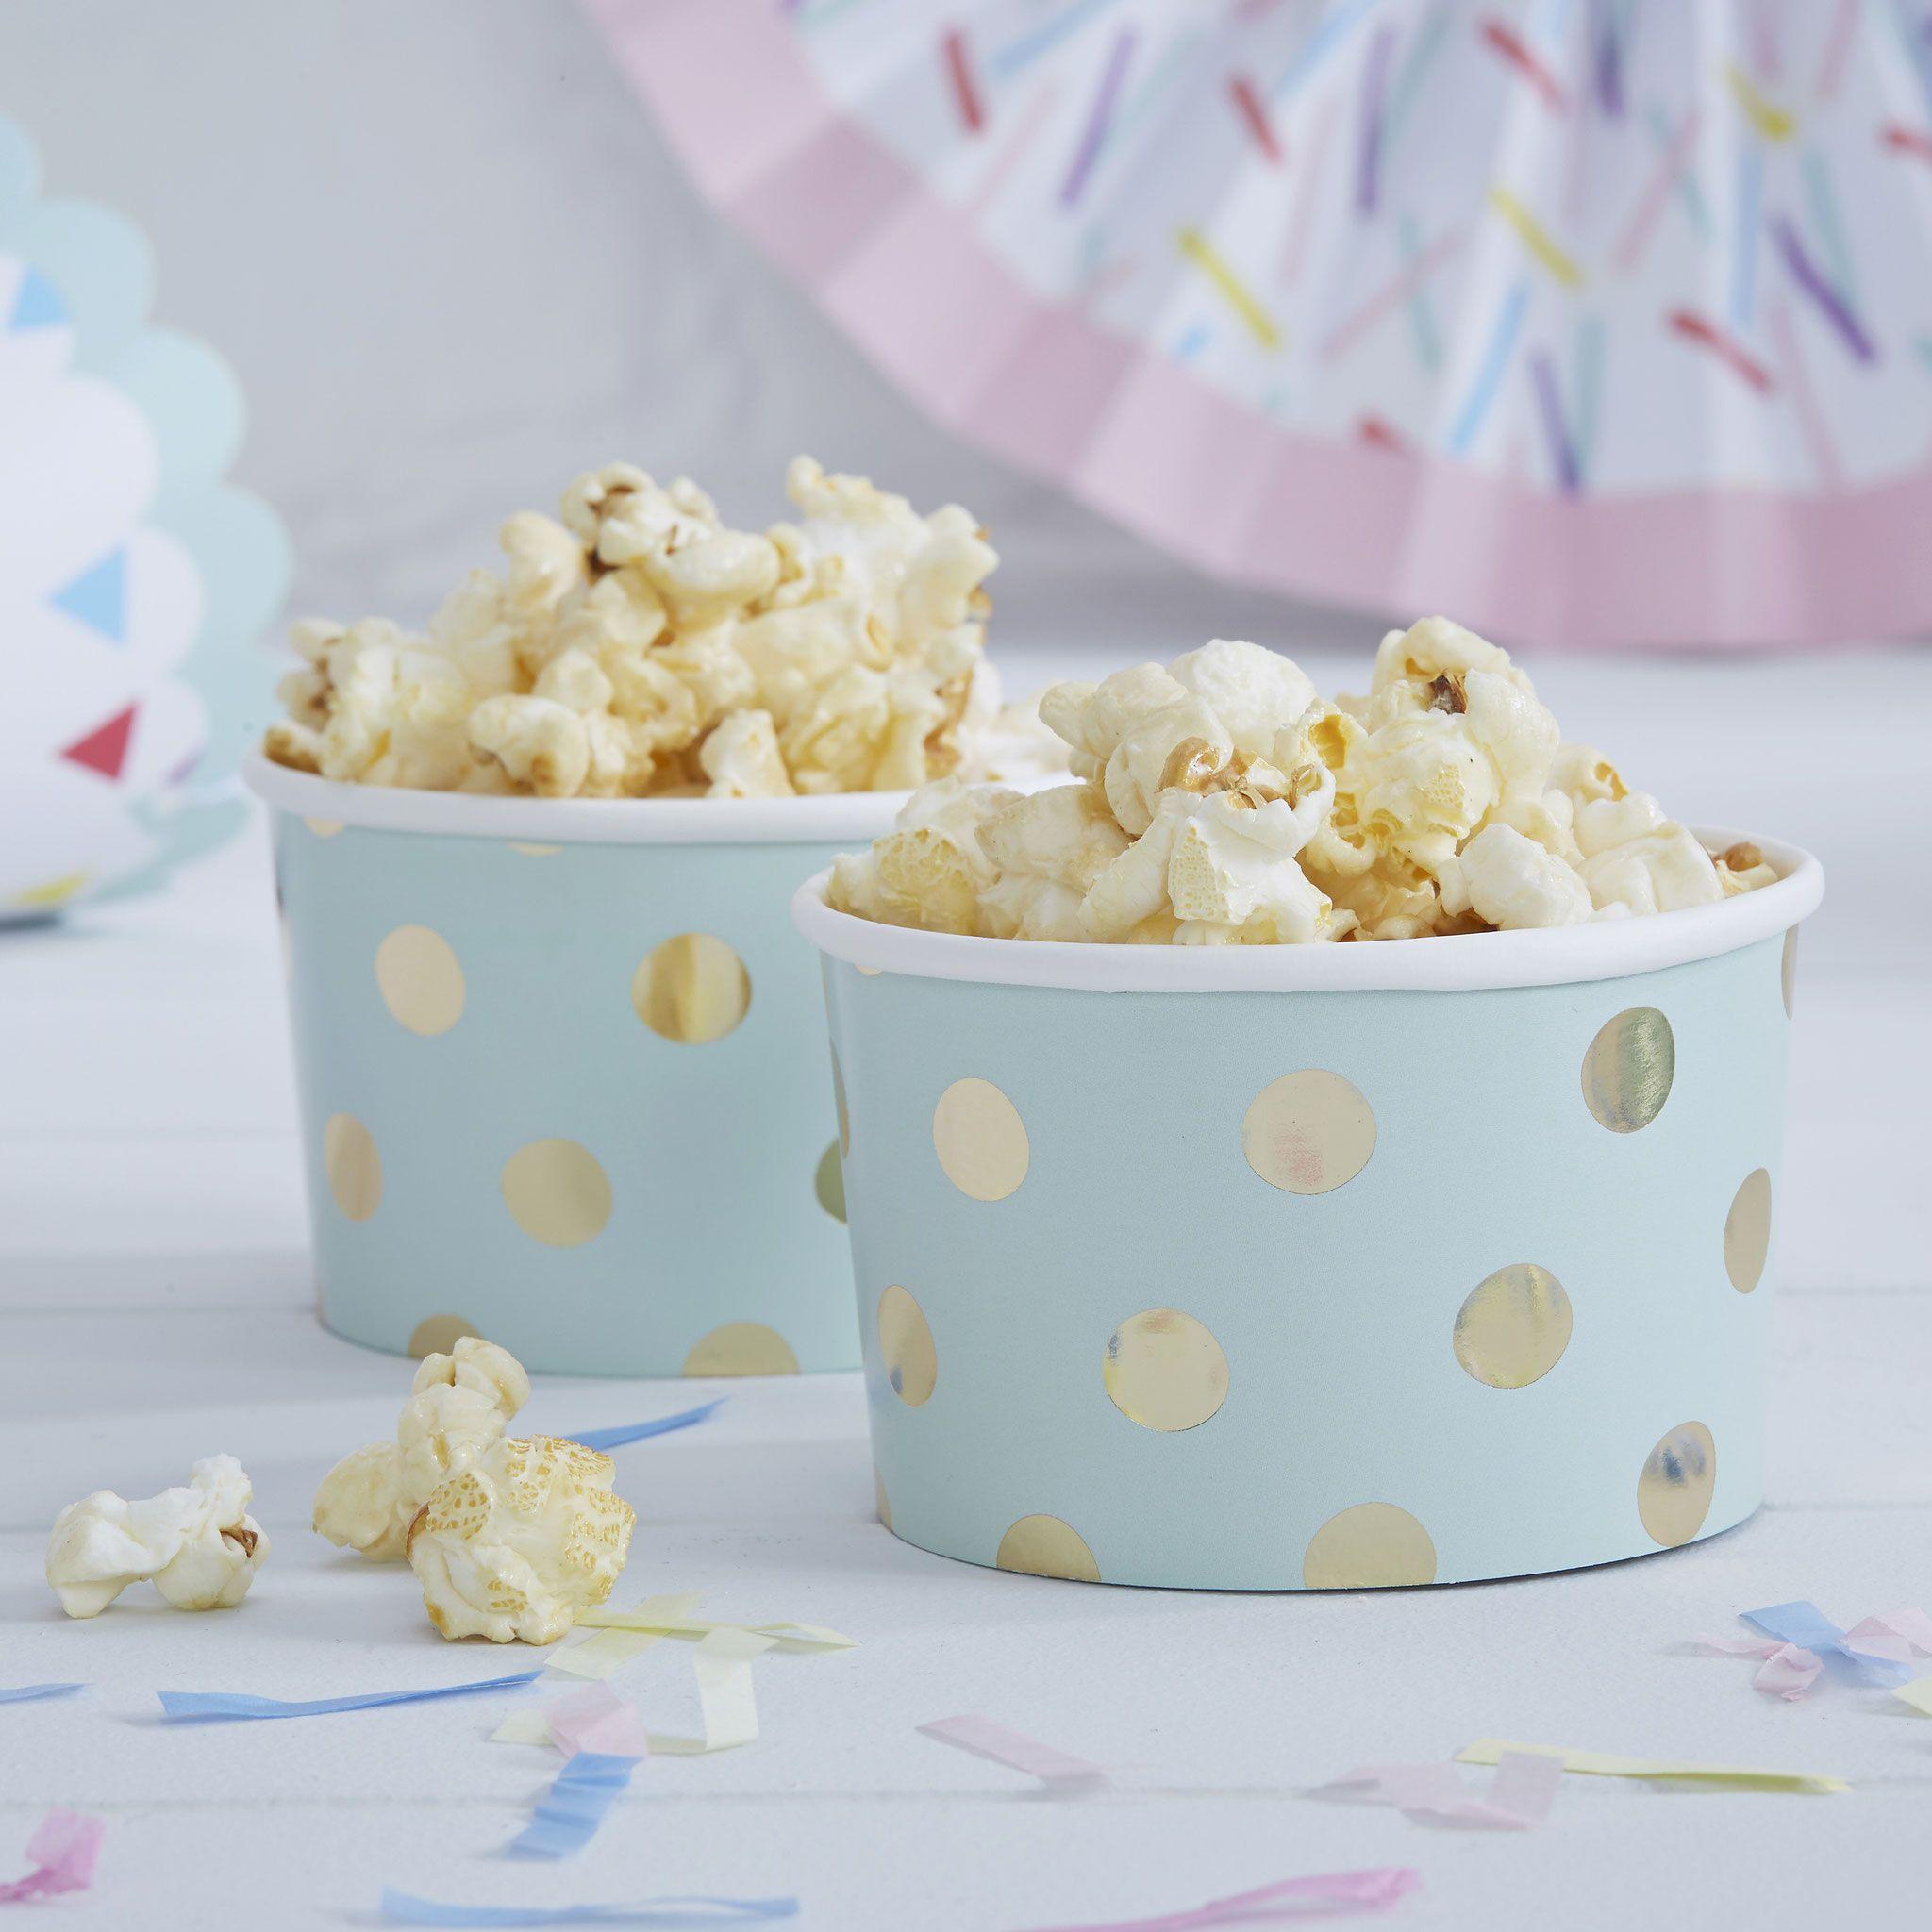 coupes pastels pour decoration baby shower, fete anniversaire pastel- pastel cups for baby shower, pastel birthday decoration